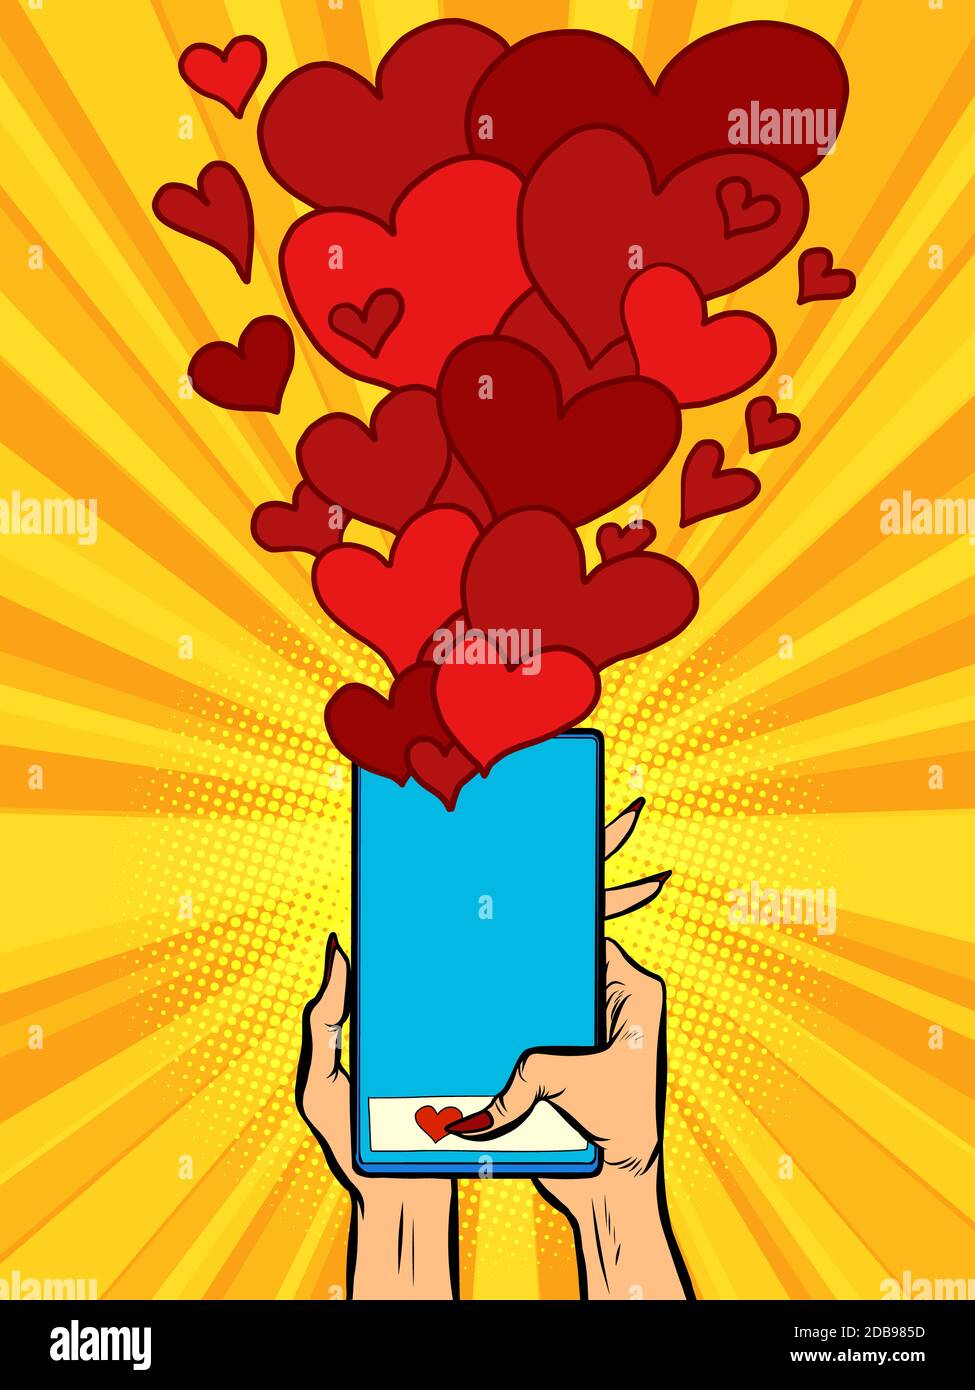 Phone Hearts Social Networks Sympathy Connections Comic Cartoon Pore Art Retro Vector Kitsch Vintage Stock Photo Alamy